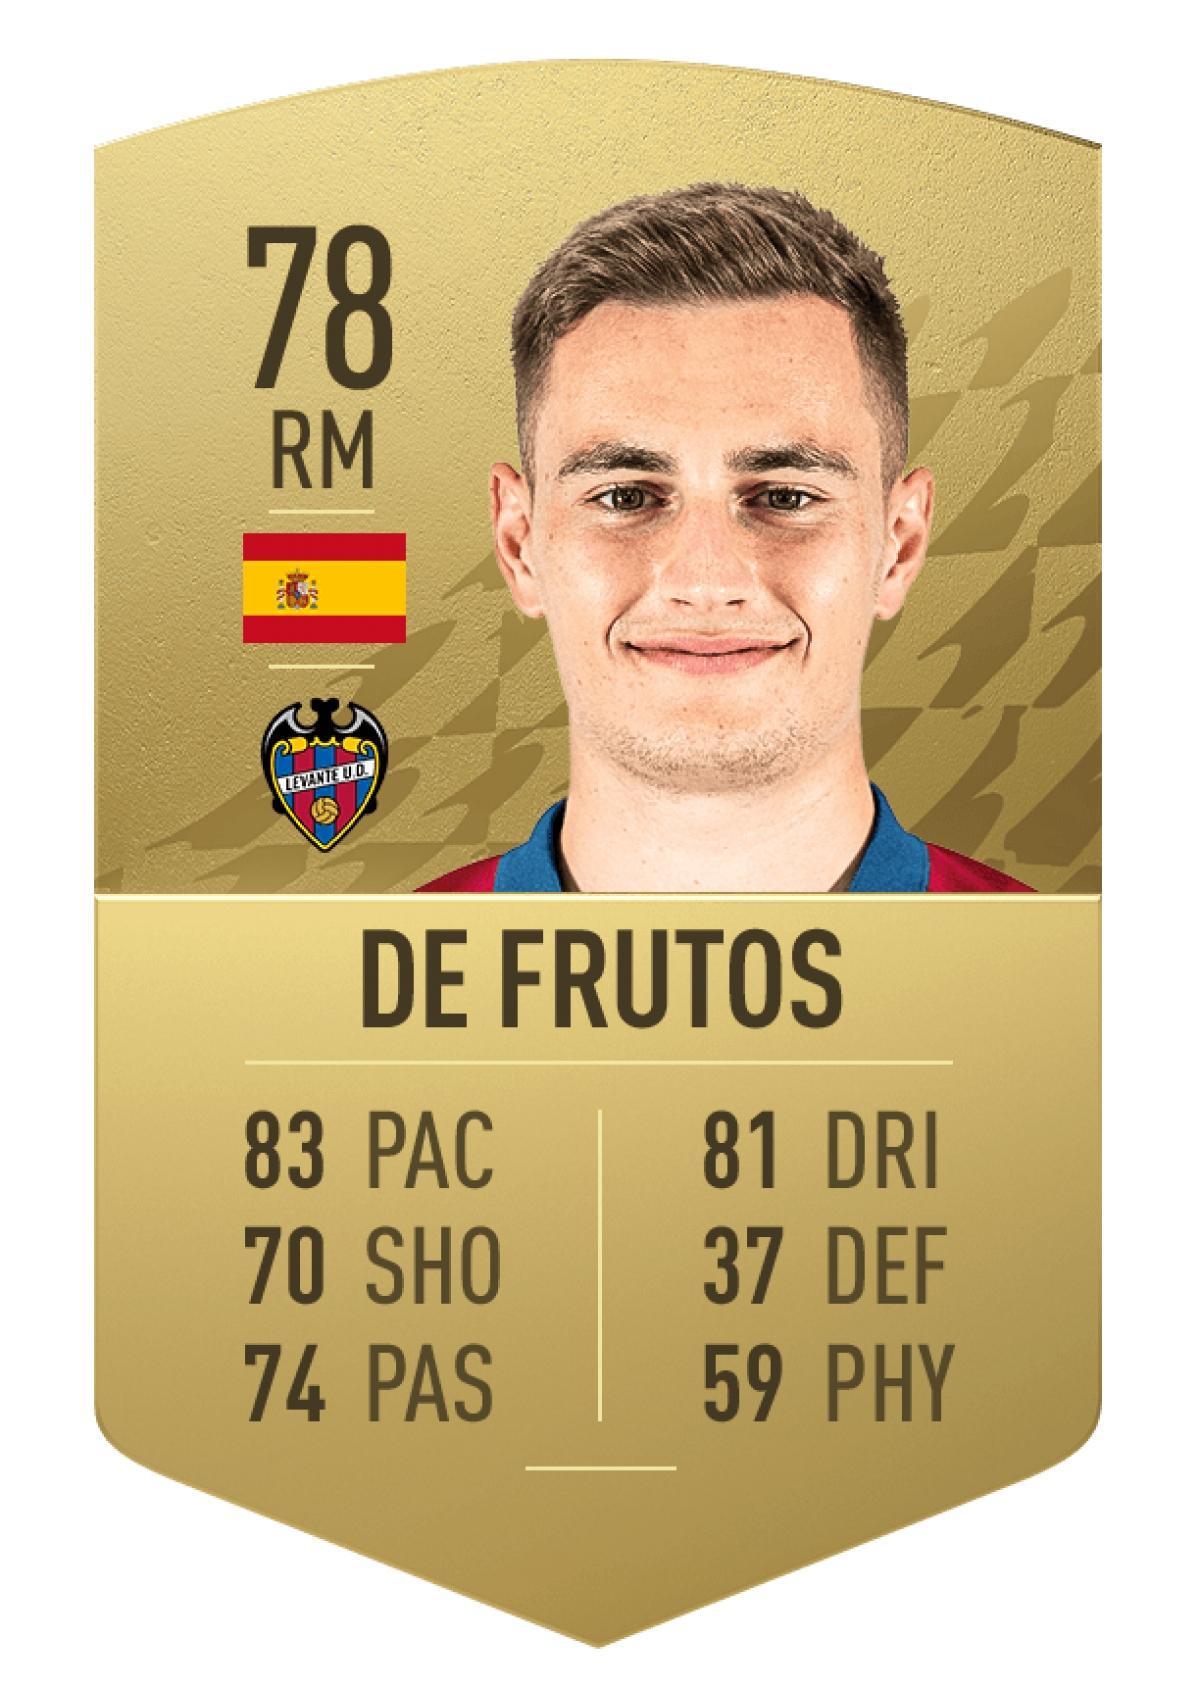 4. Tiền vệ Jorge De Frutos | Levante | Tổng chỉ số: 78 (+11 so với FIFA 21)